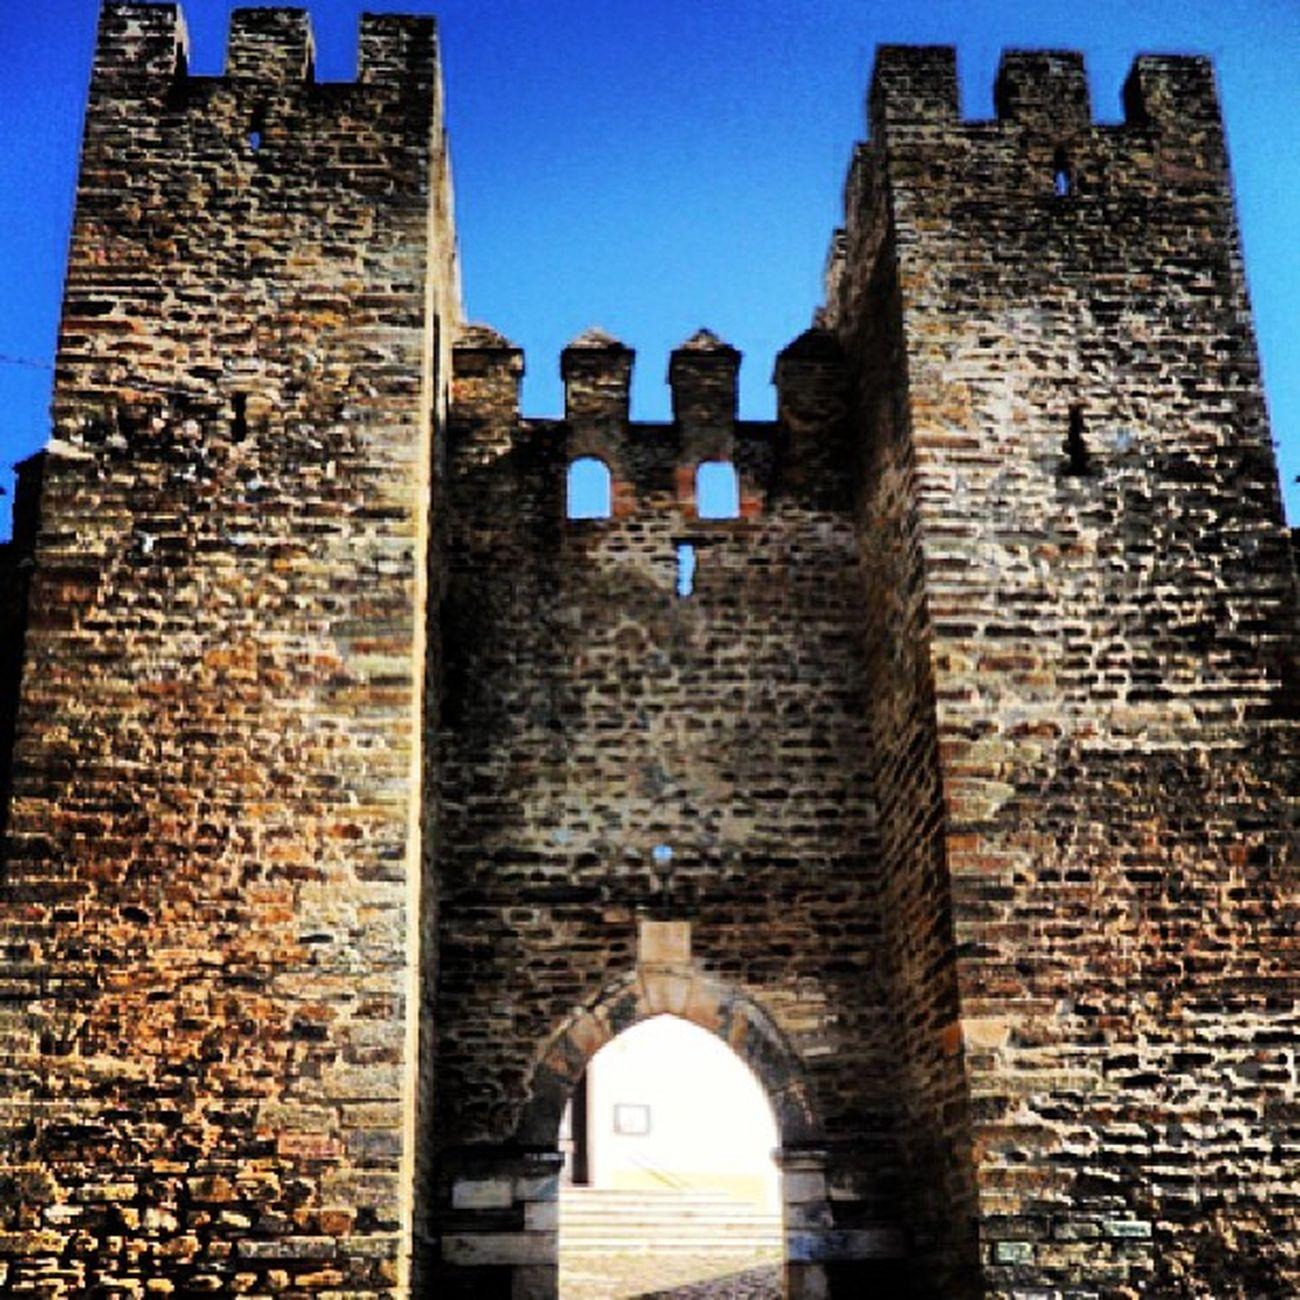 #evora #borba #alentejo #igers #igersportugal #portugaligers #portugal_em_fotos #portugaldenorteasul #p3top #iphonesia #iphone5 #iphoneonly #iphonephotography #instagood #instagram #instalove #instamood #instadaily #instagramhub #pictureoftheday #photogra Instagramhub Instadaily Pictureoftheday Photography Instalove Iphoneonly Portugaligers Photooftheday Igersportugal Iphonesia Portugaldenorteasul Instagram Iphonephotography IPhone5 Portugal_em_fotos Instamood Évora  Borba P3top Igers Alentejo Instagood